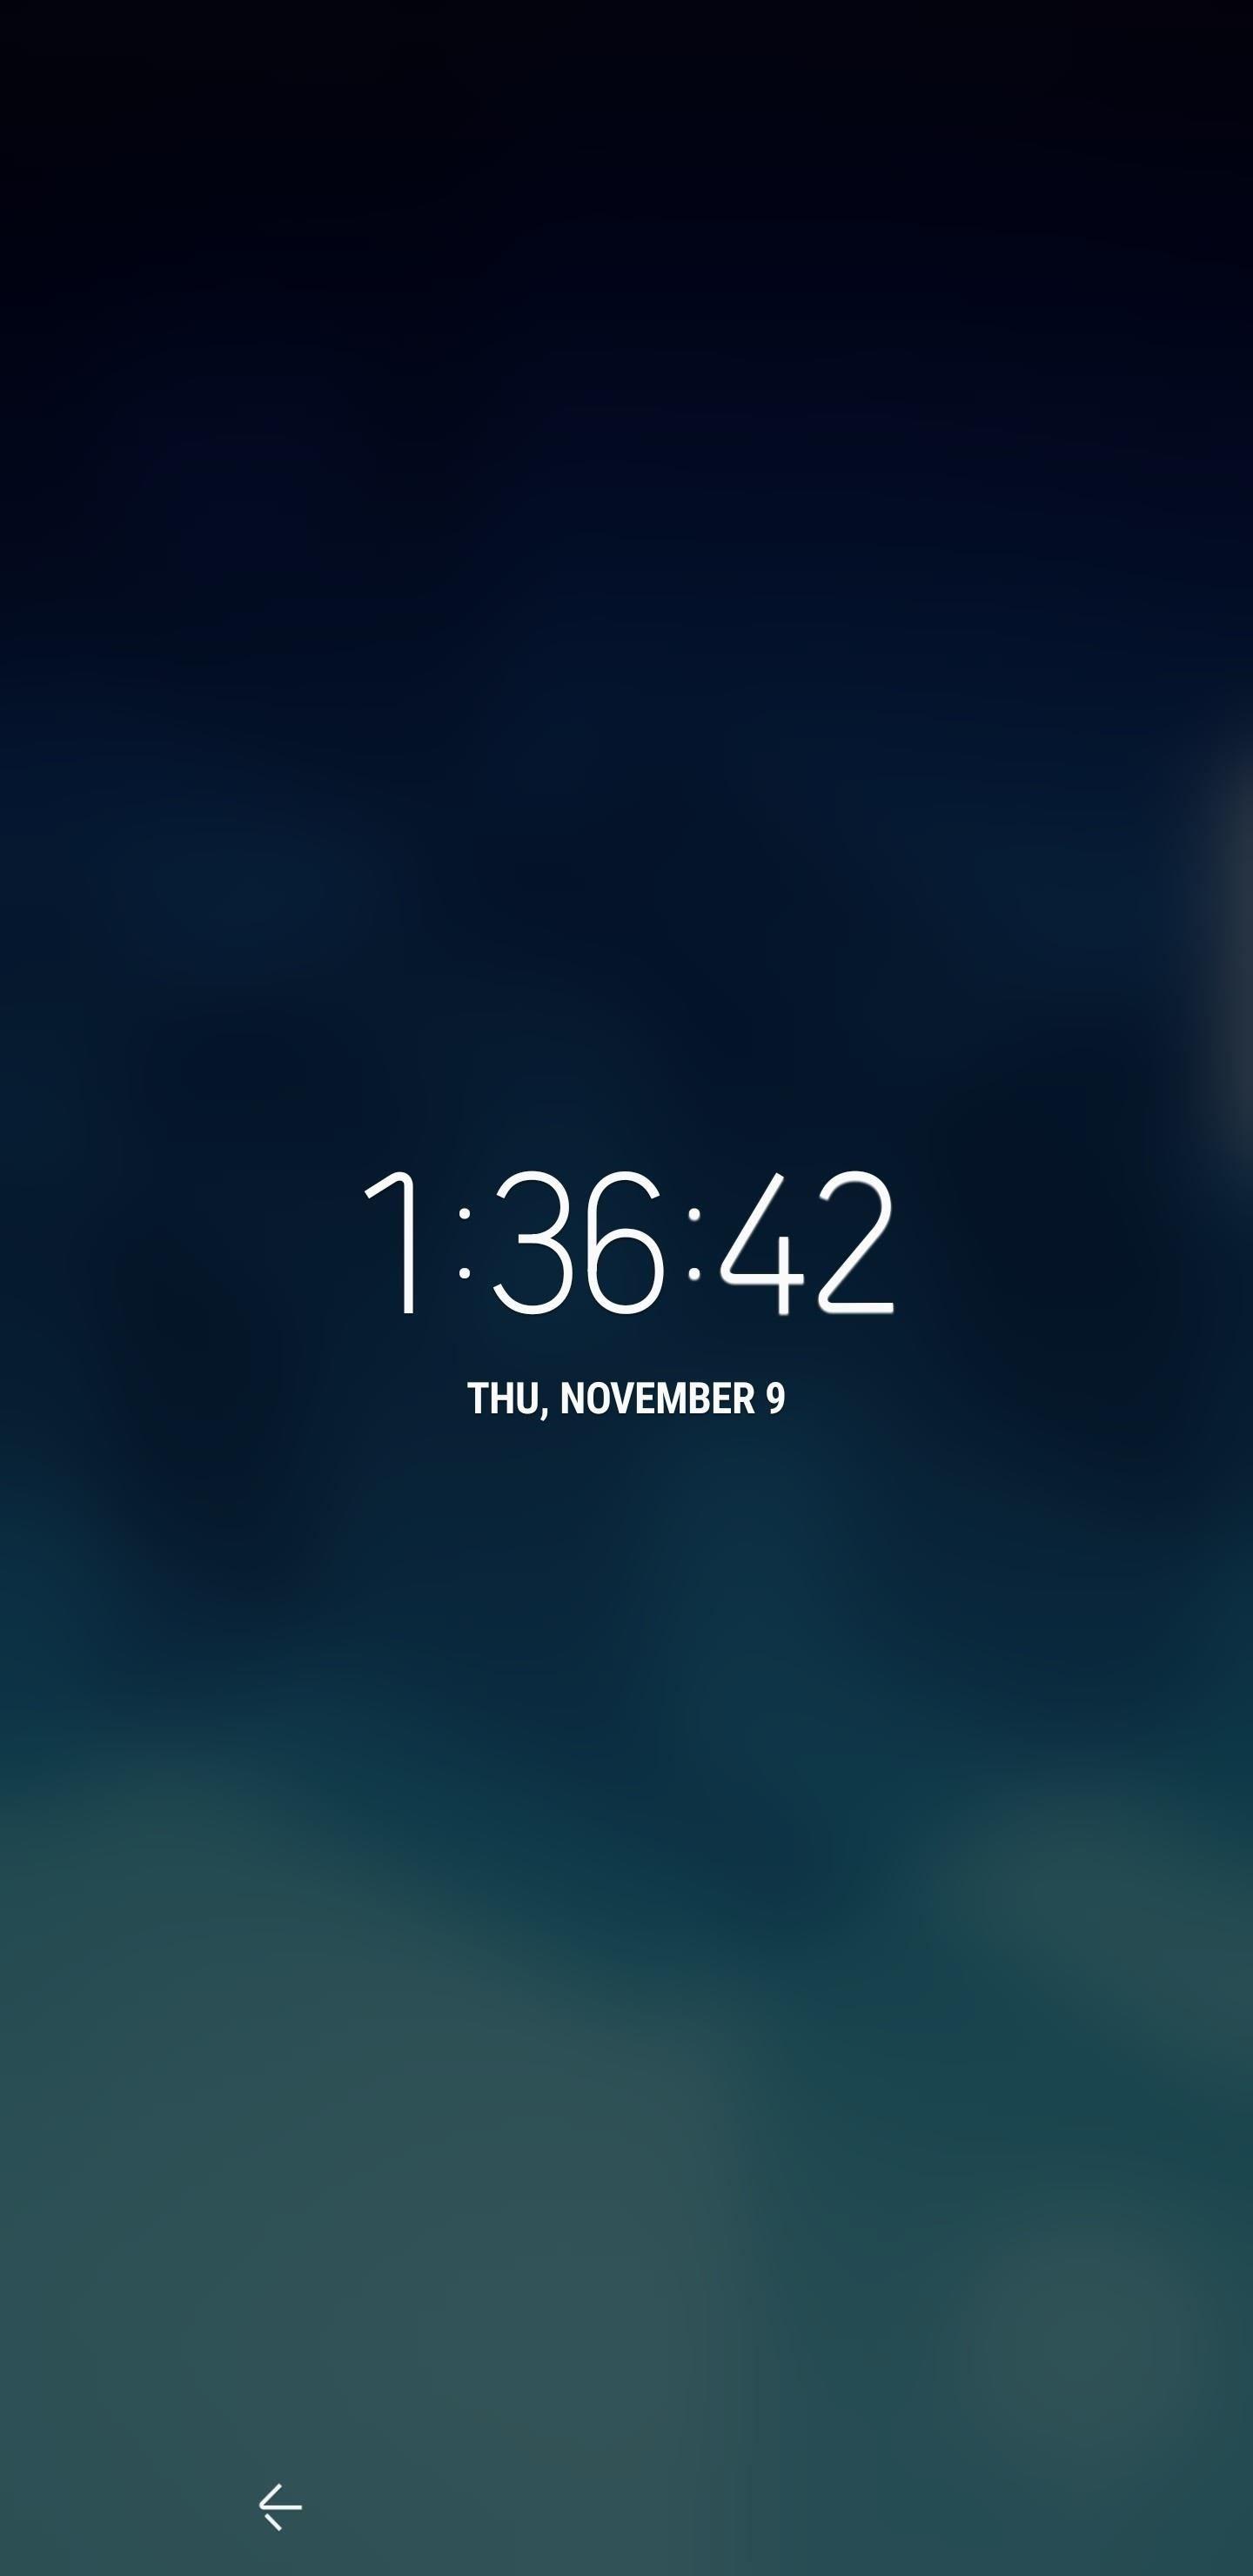 48 Samsung S8 Wallpaper Lock Screen On Wallpapersafari